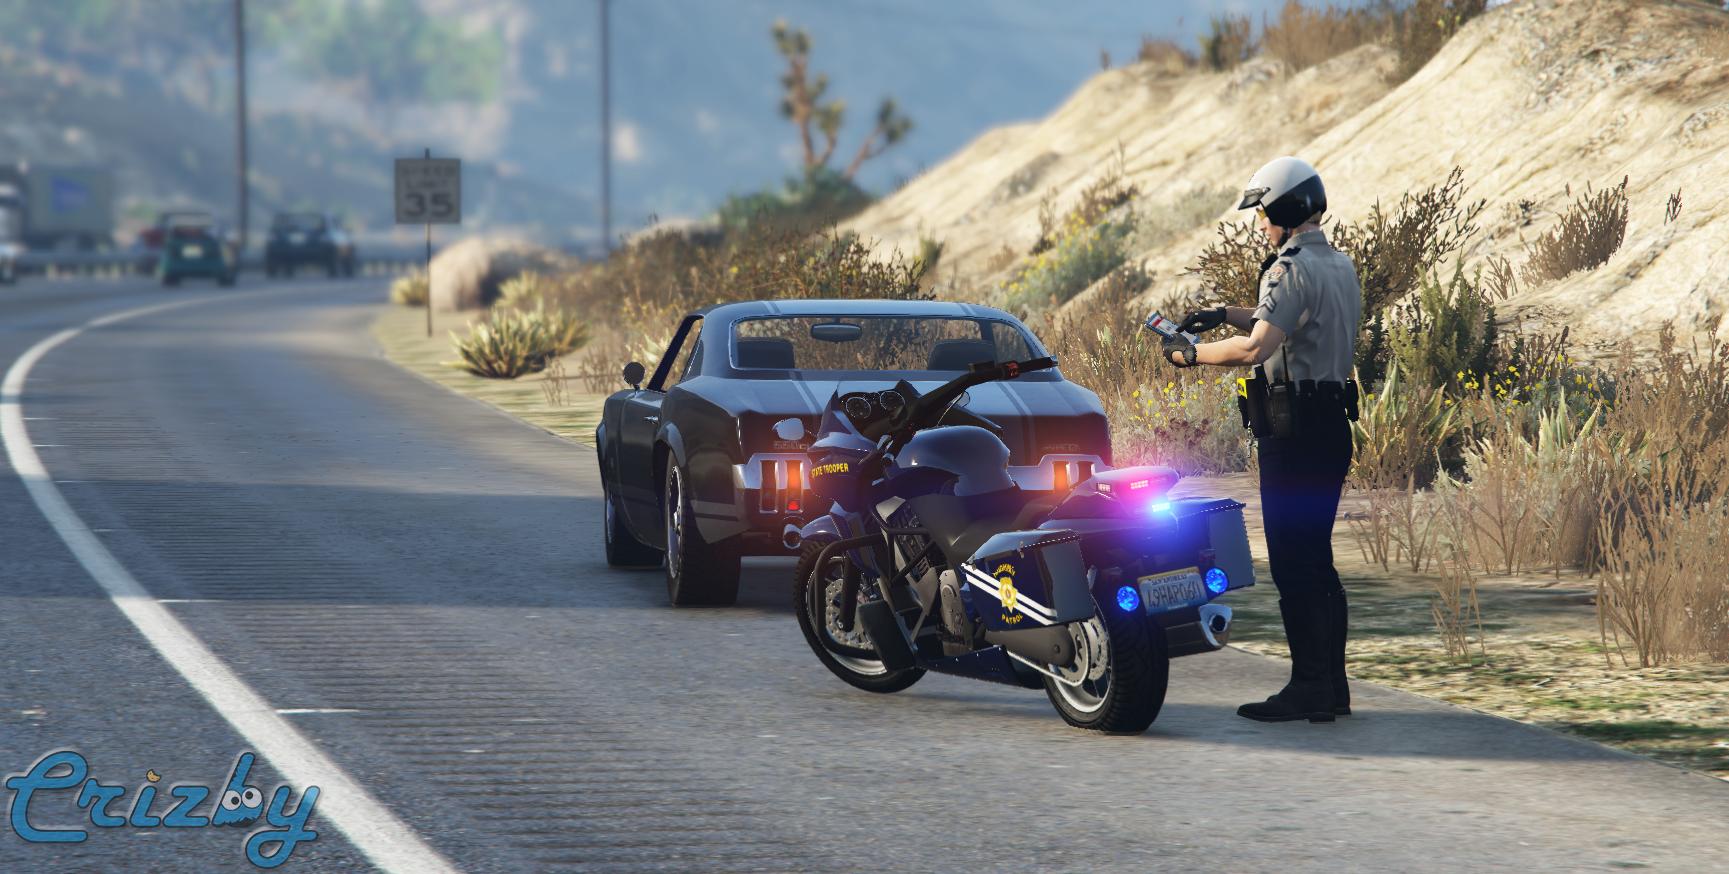 Low Speeds, High Fines